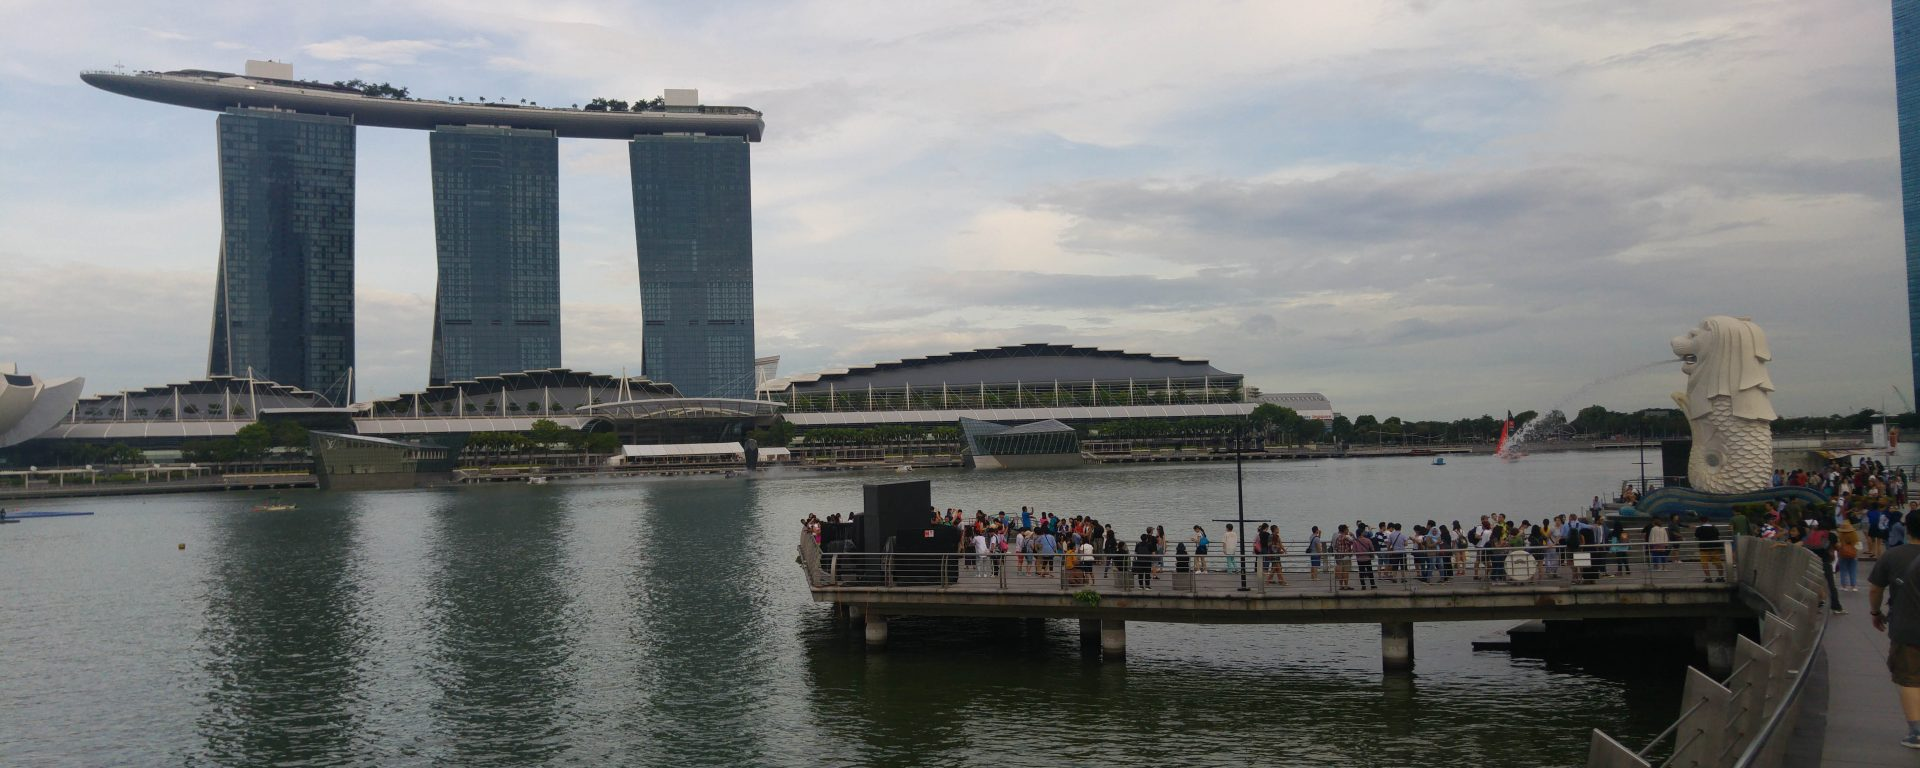 Merlion Park Singapur